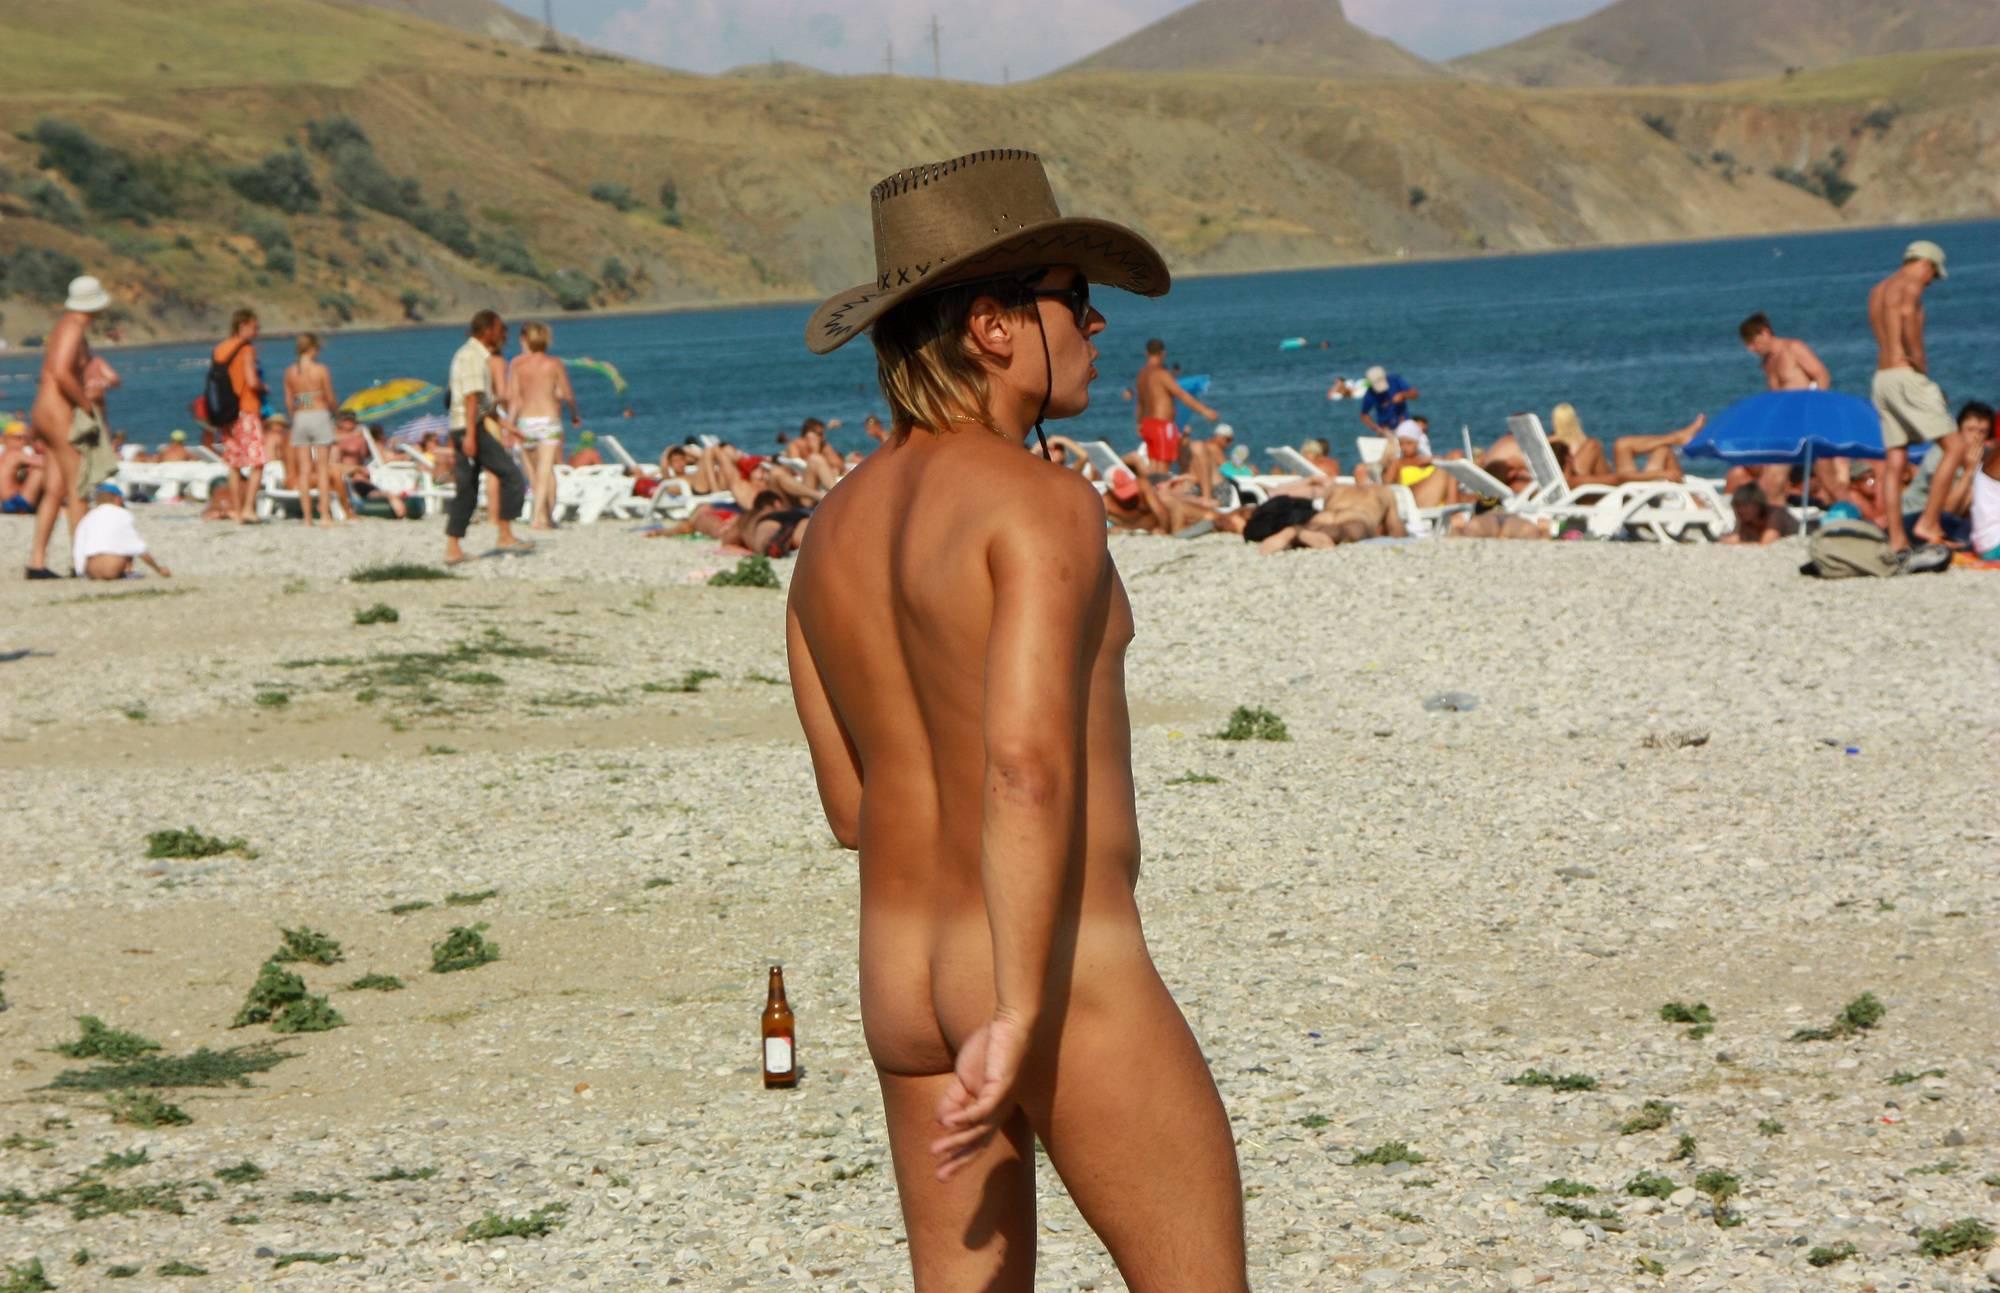 Pure Nudism Images-Ukraine Beach Friendship - 2